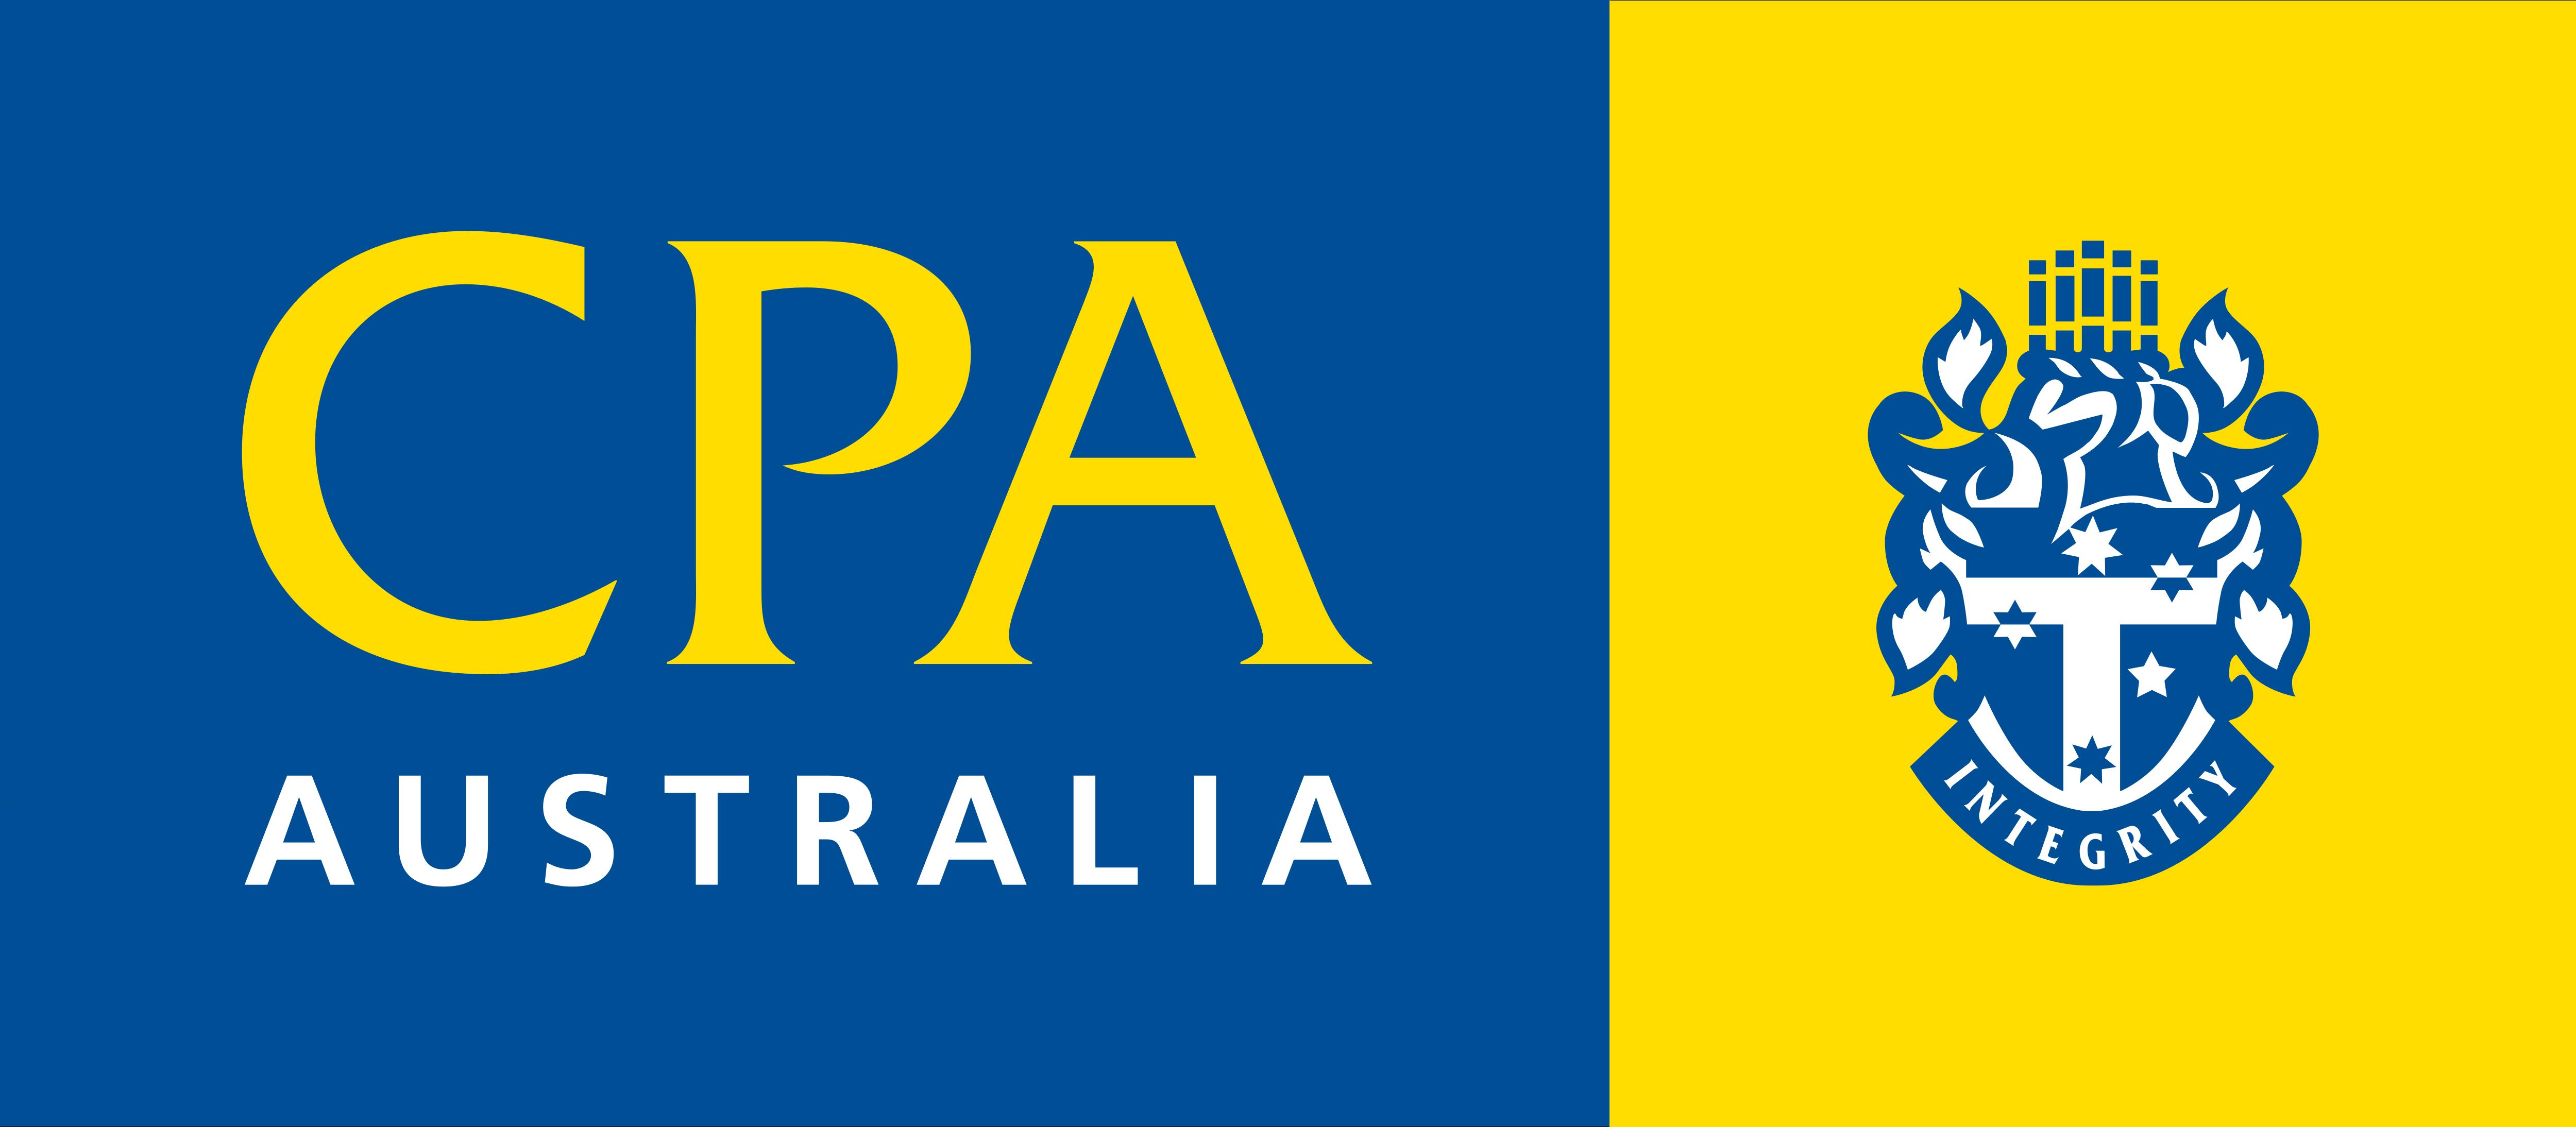 CPA Australia.